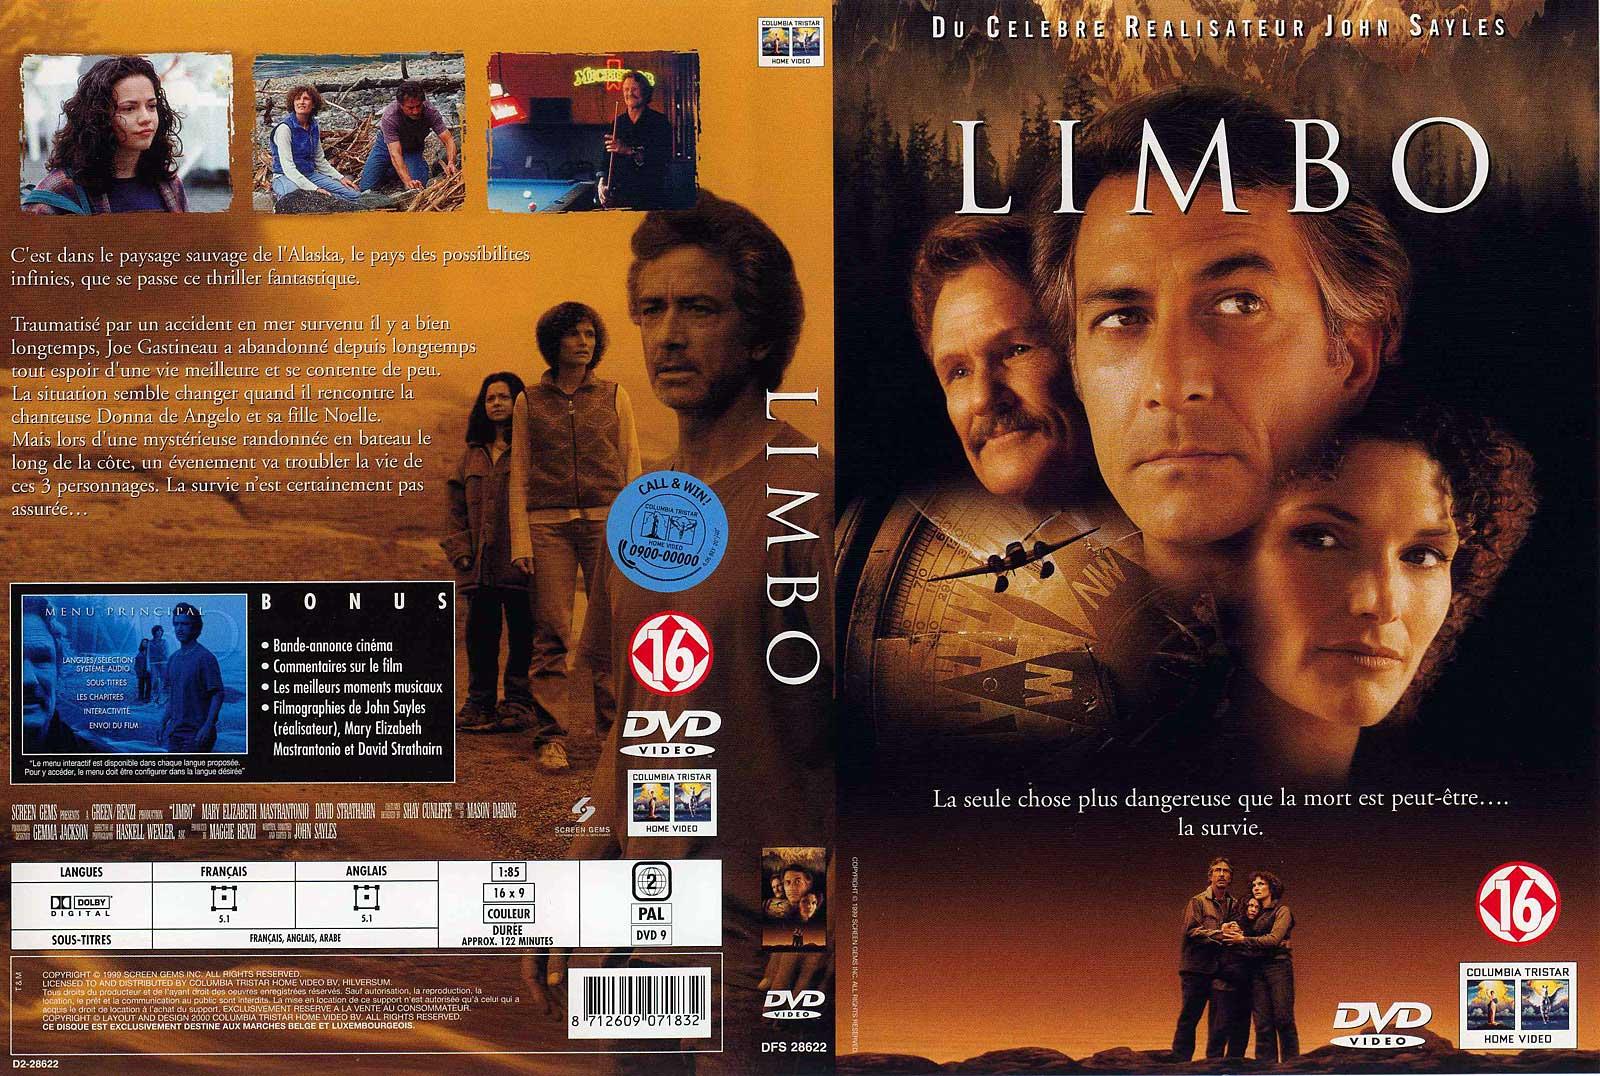 Jaquette DVD Limbo